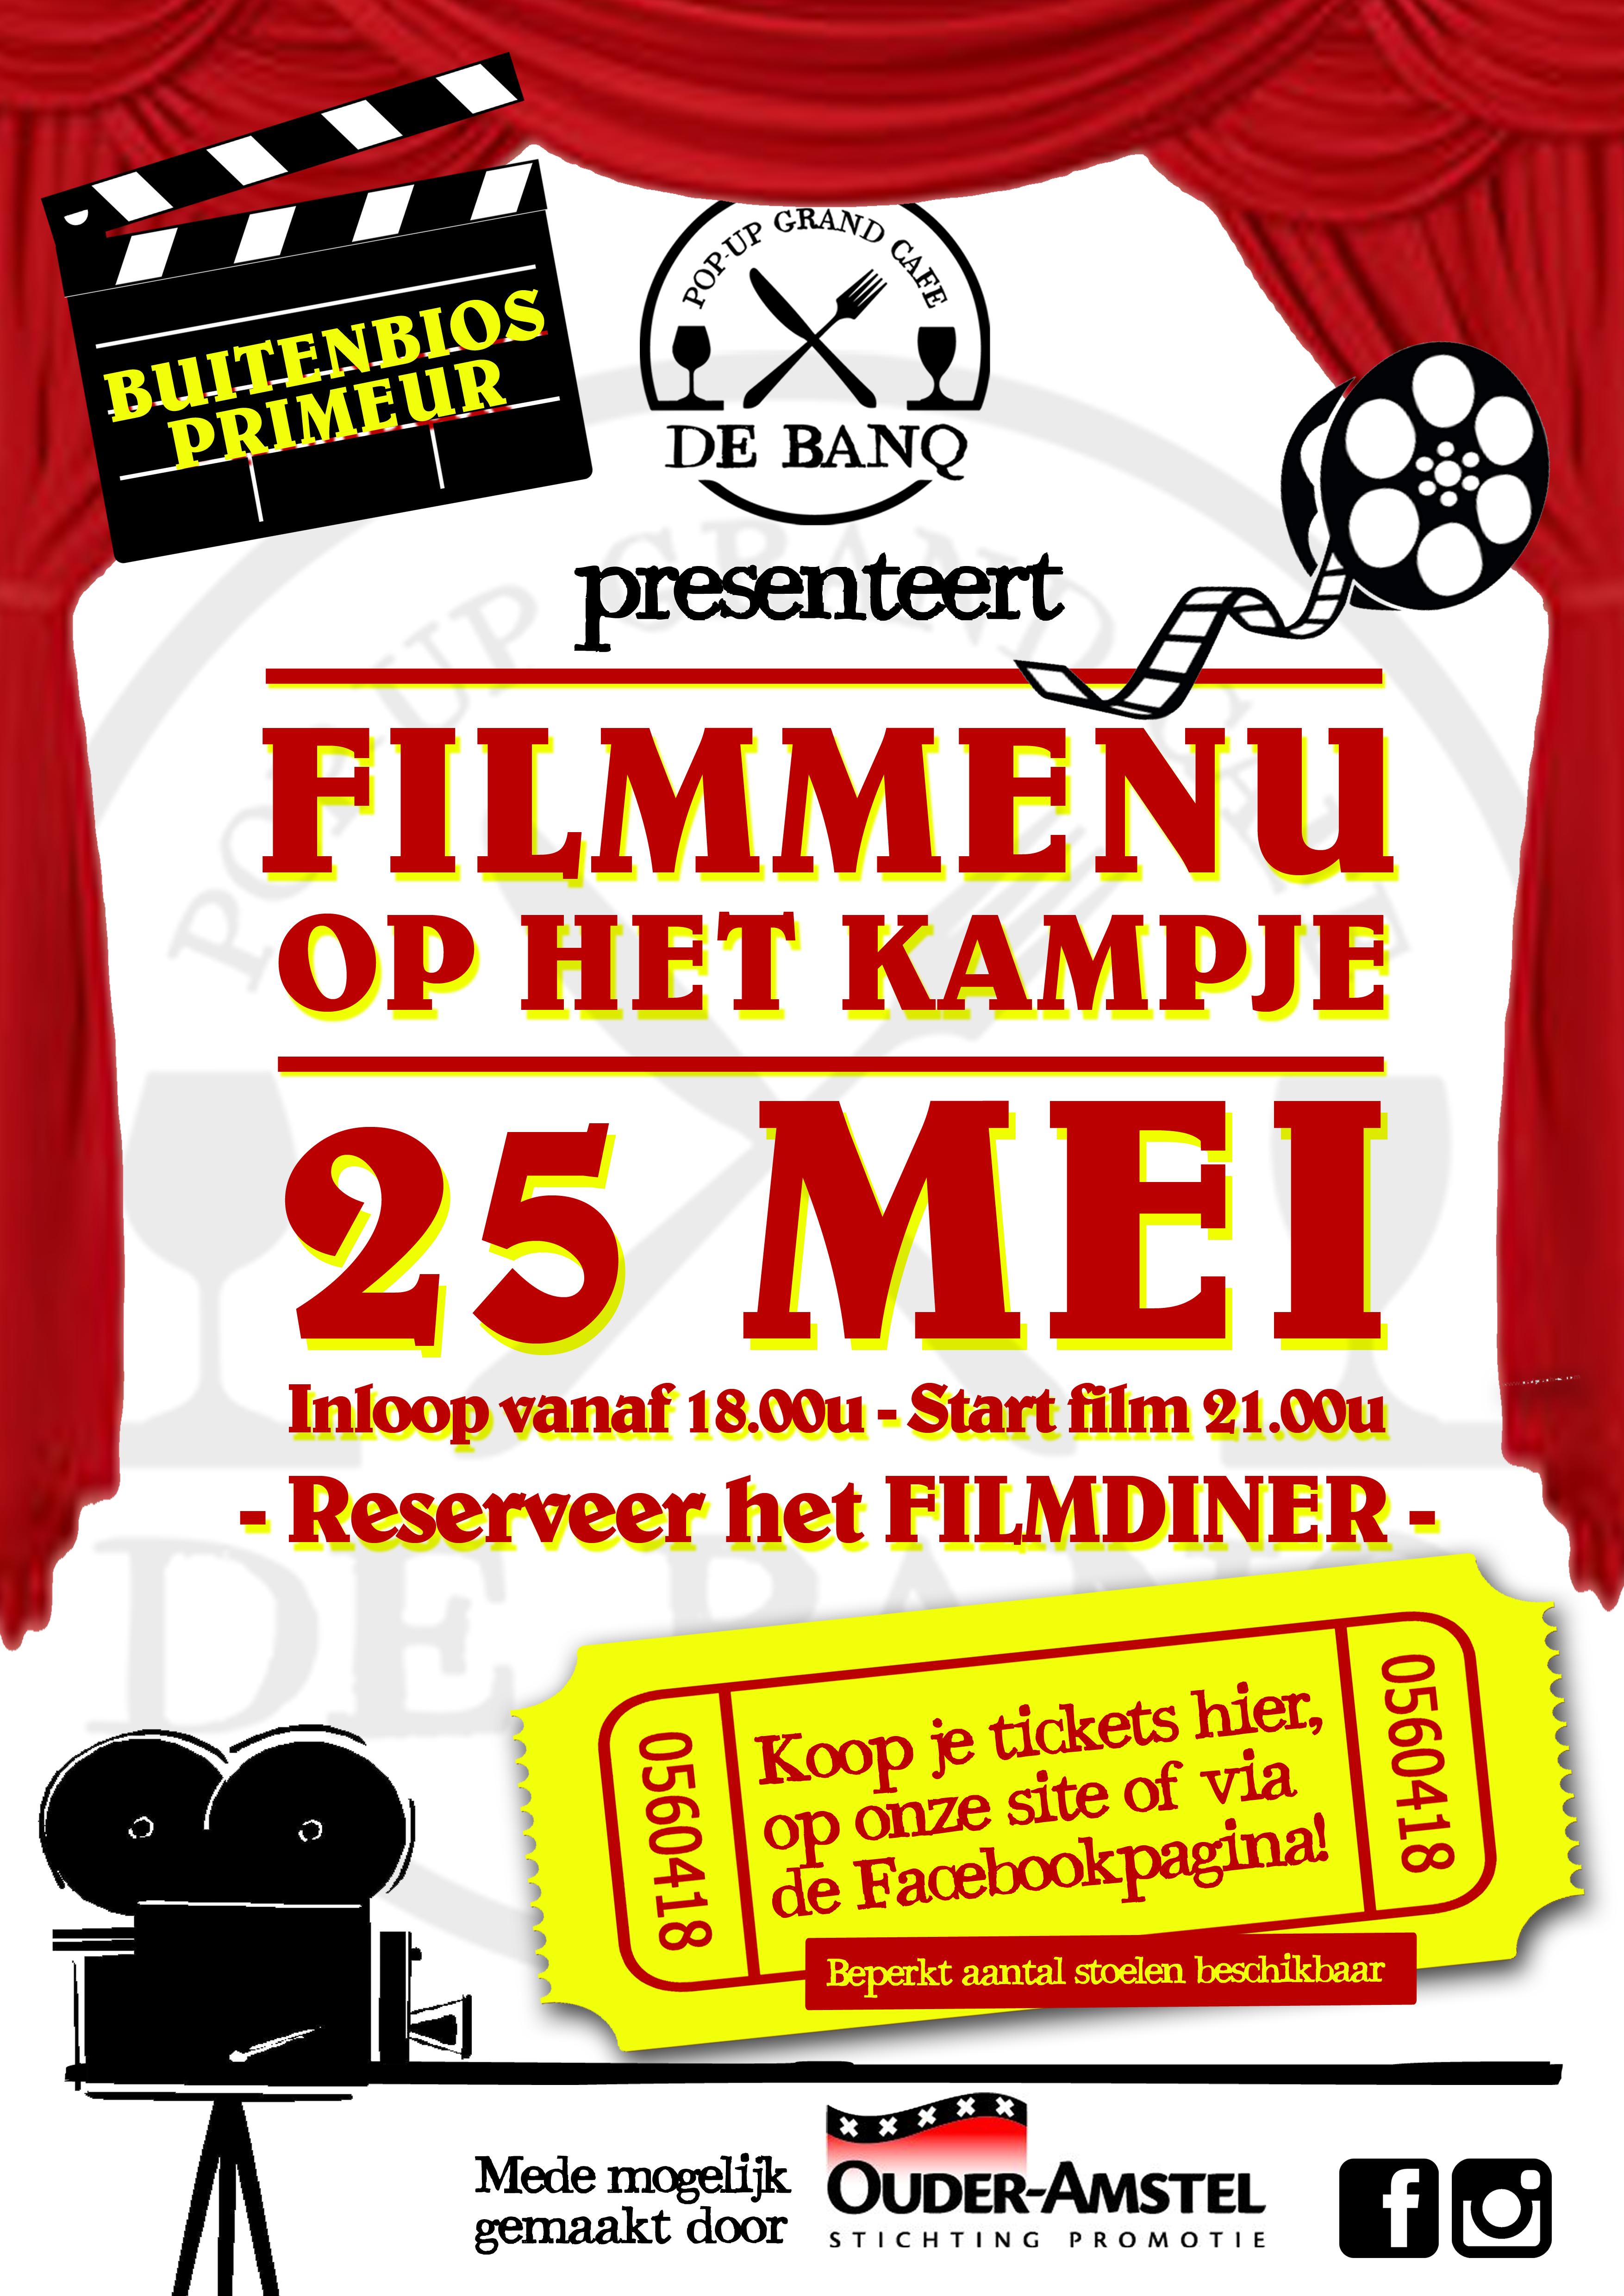 Poster-Filmmenu bij de BANQ (1)